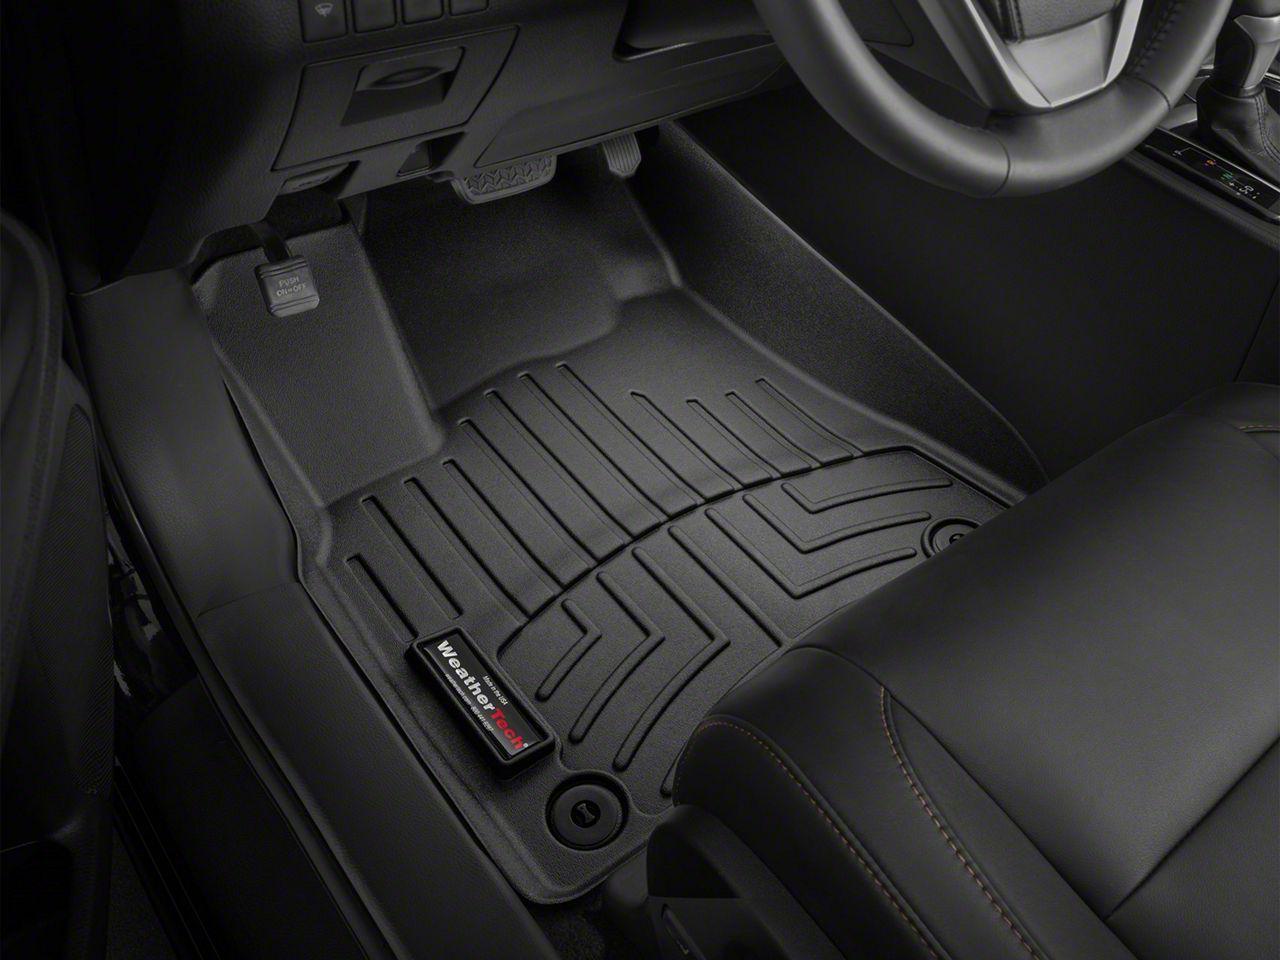 Weathertech DigitalFit Front Floor Liners - Black (12-15 Tacoma Regular Cab, Access Cab)